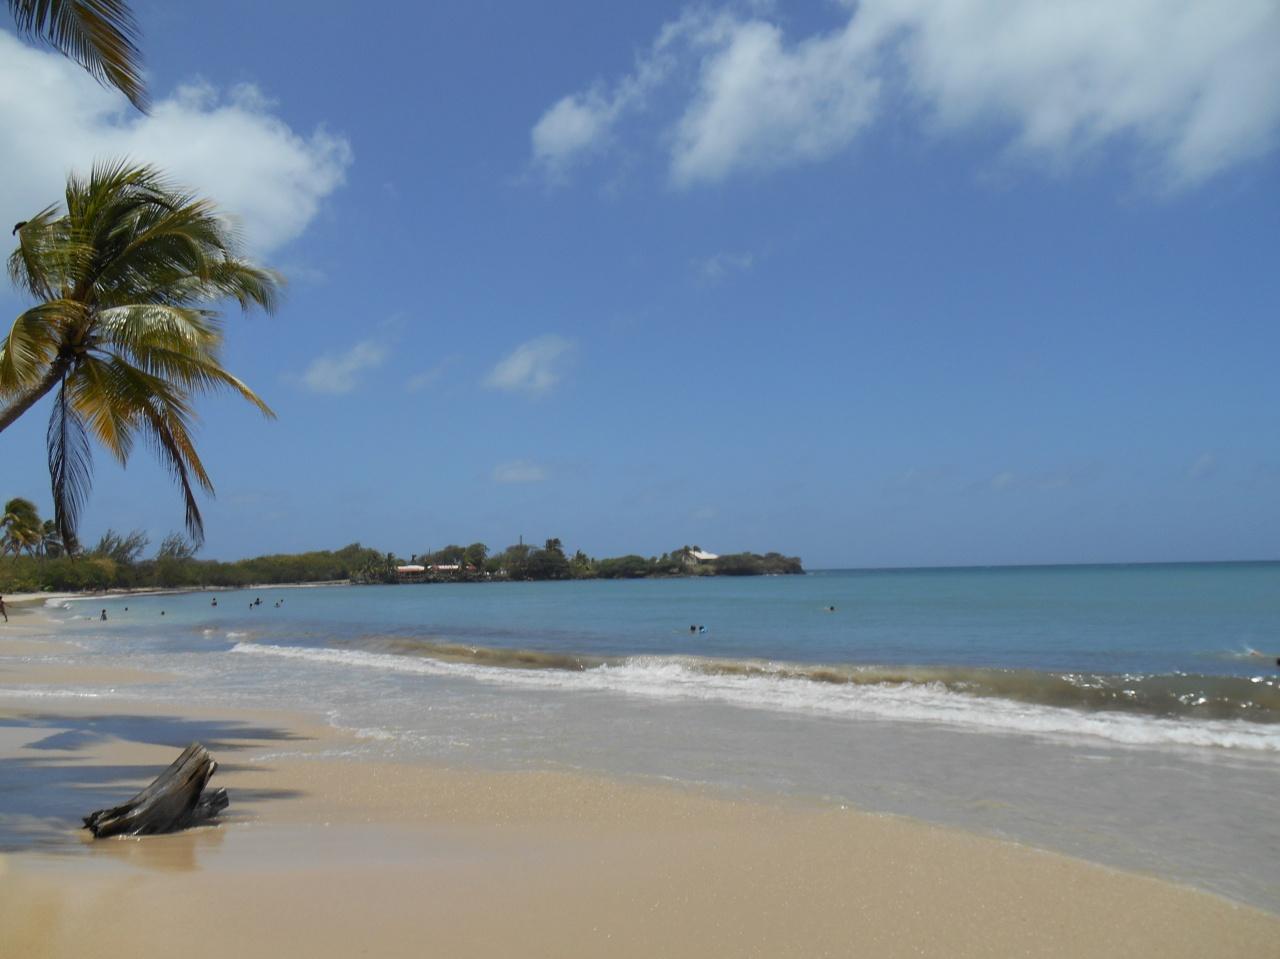 Un samedi sur la plage de Salines,Martinique.